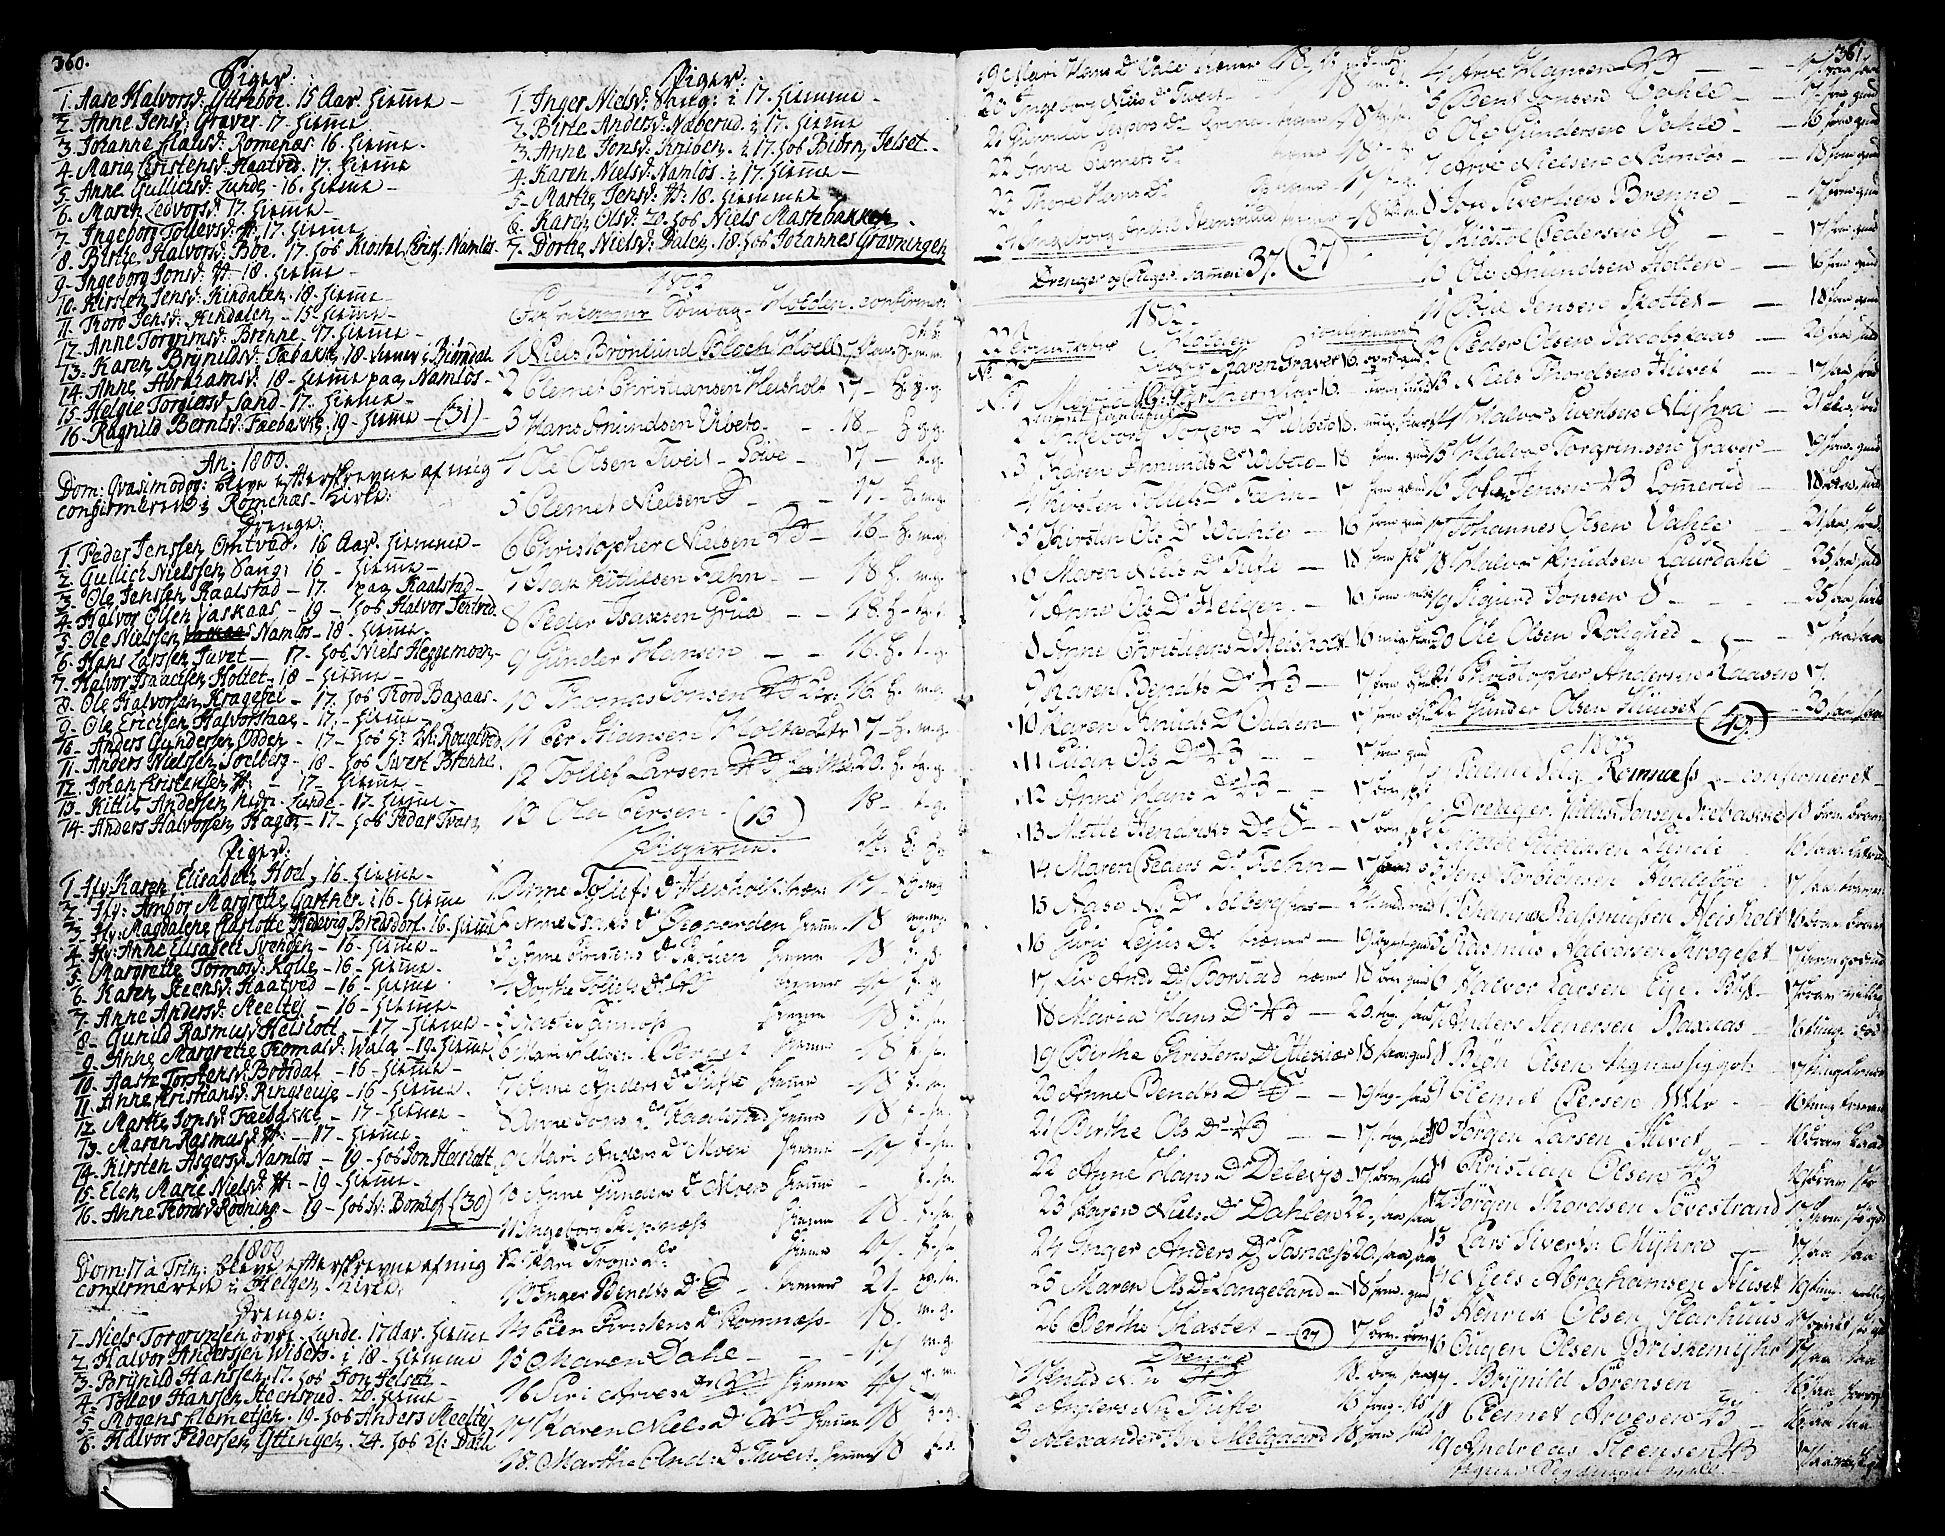 SAKO, Holla kirkebøker, F/Fa/L0002: Ministerialbok nr. 2, 1779-1814, s. 360-361